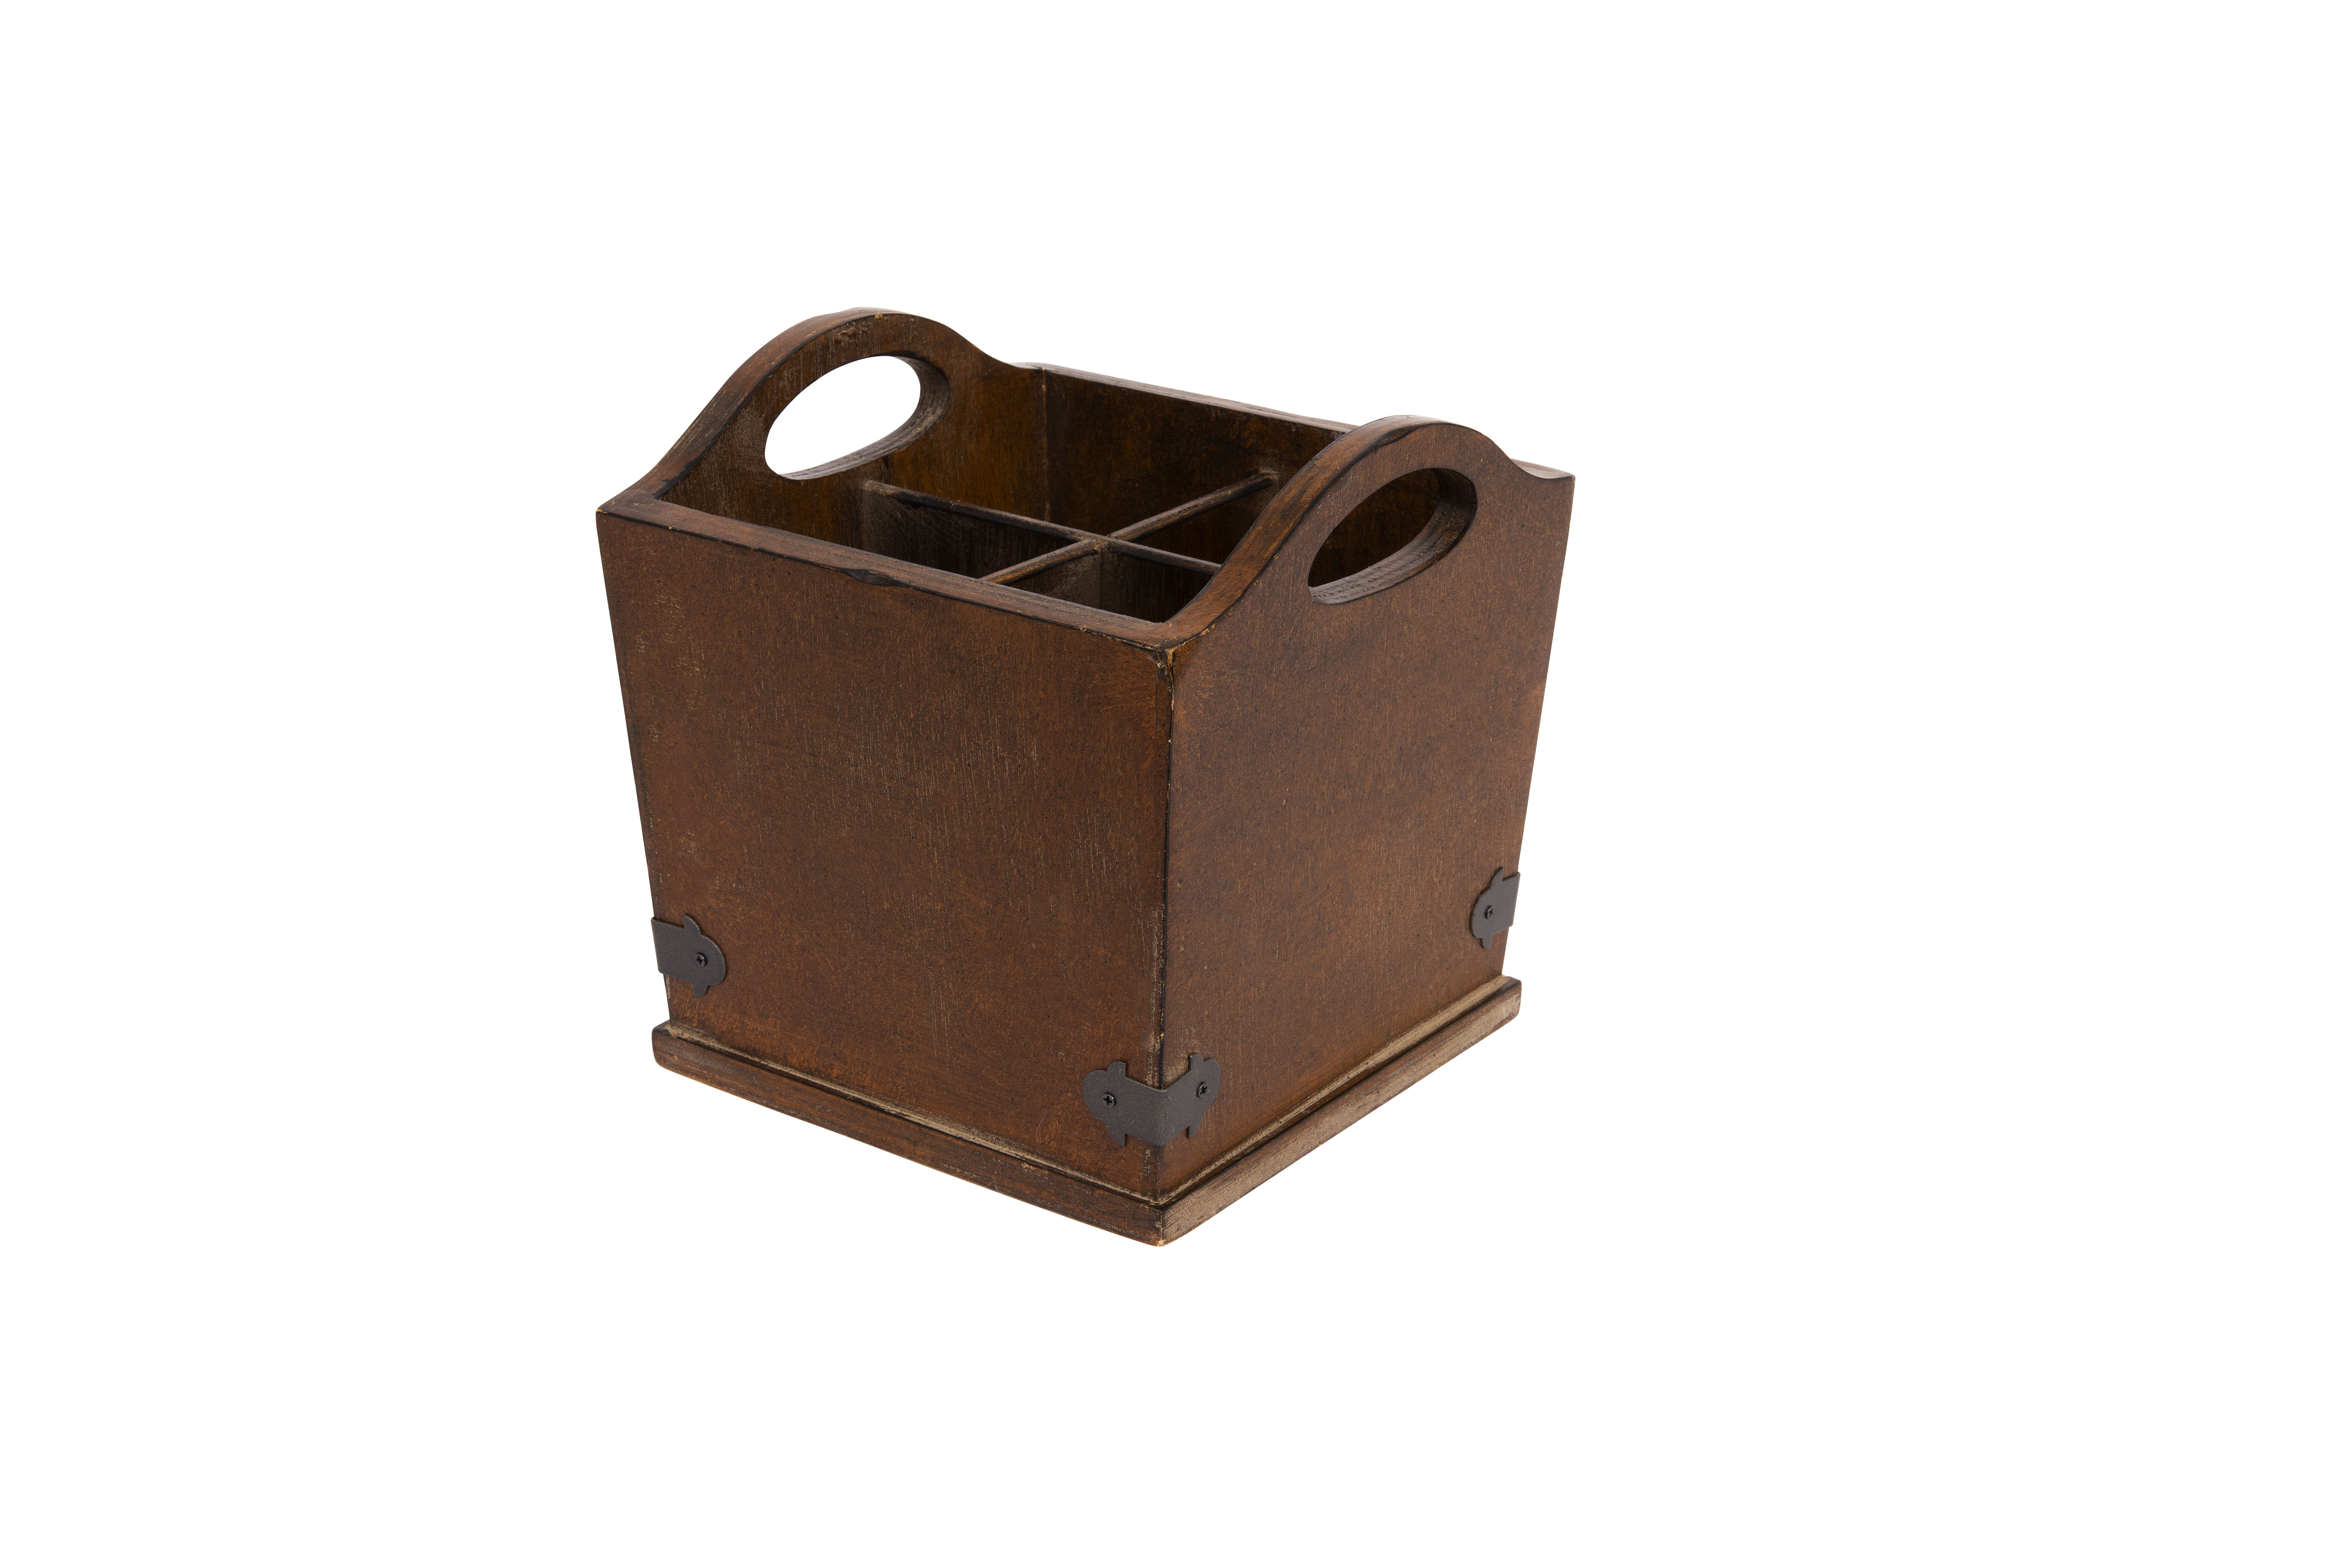 Condiment Caddy Picnic Plus Decka Portable Utensil